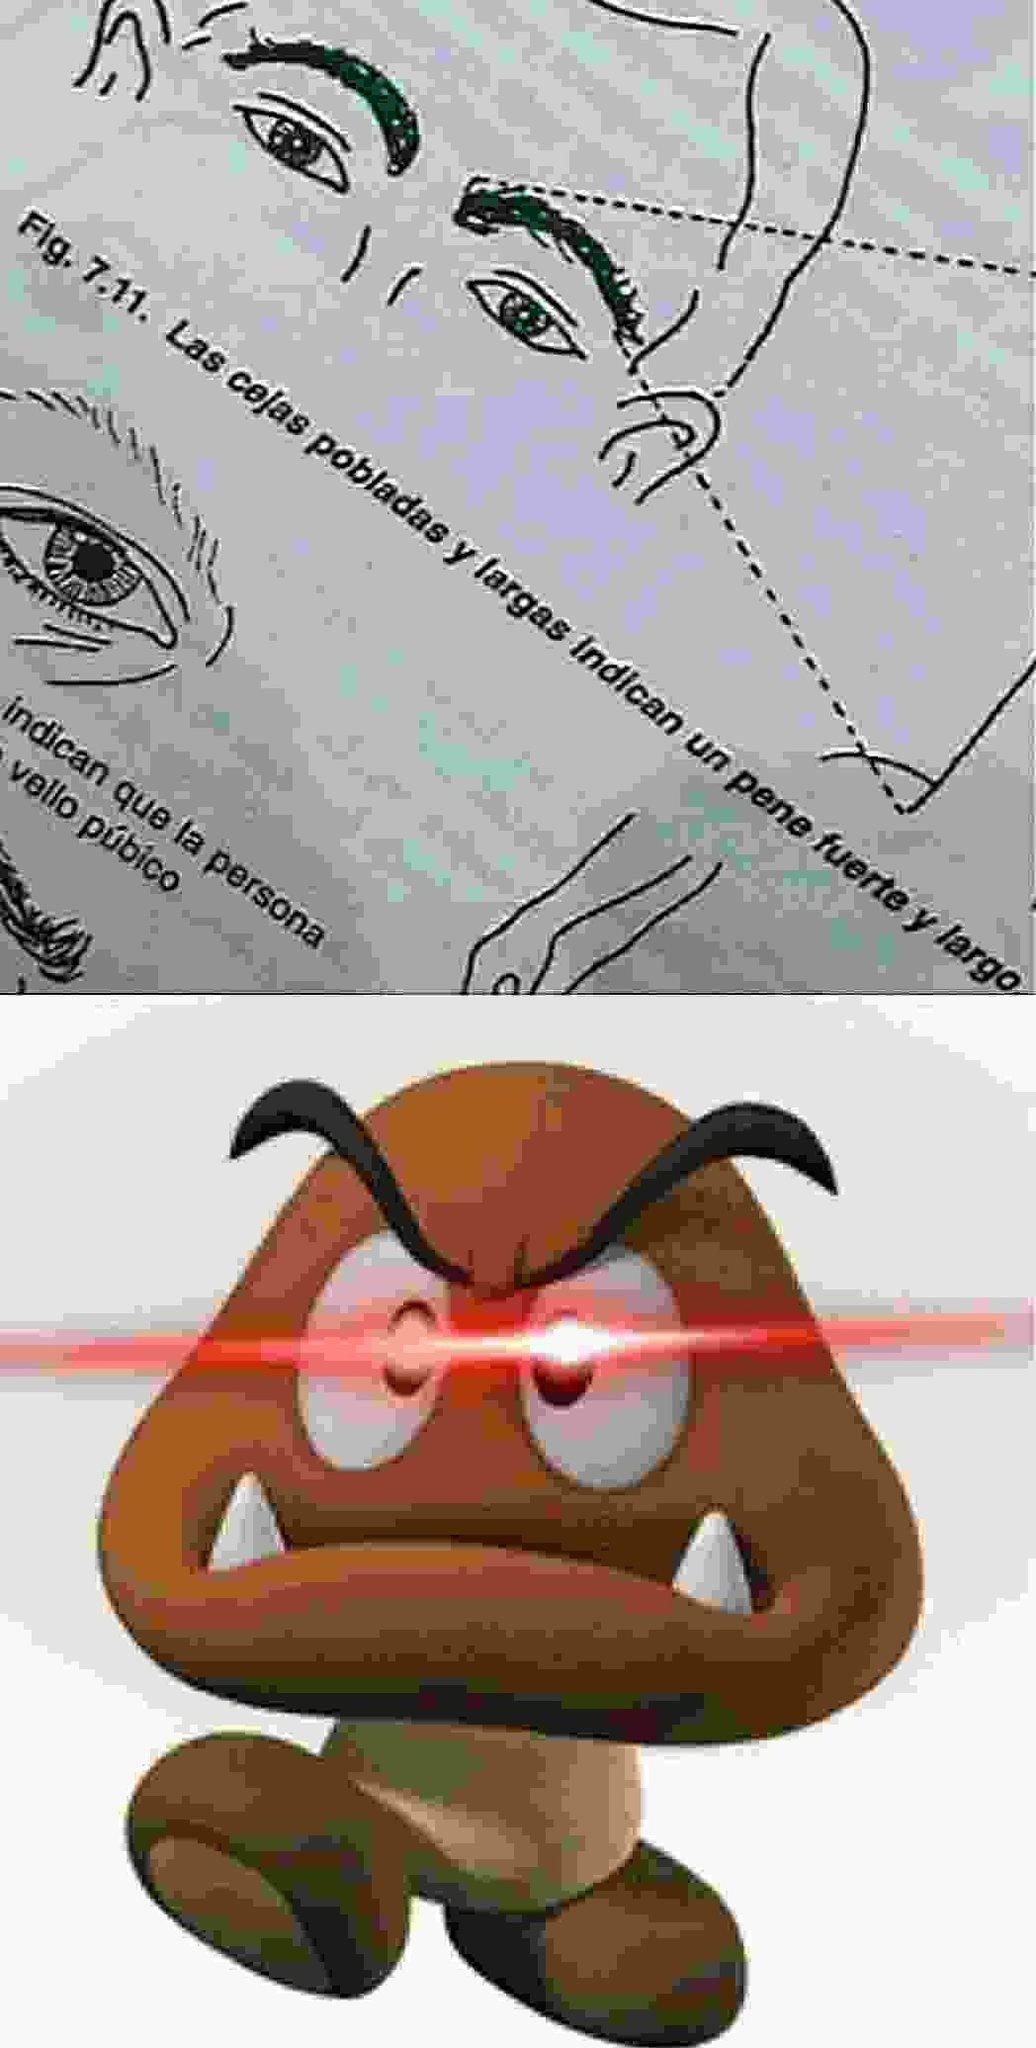 Goombs - meme